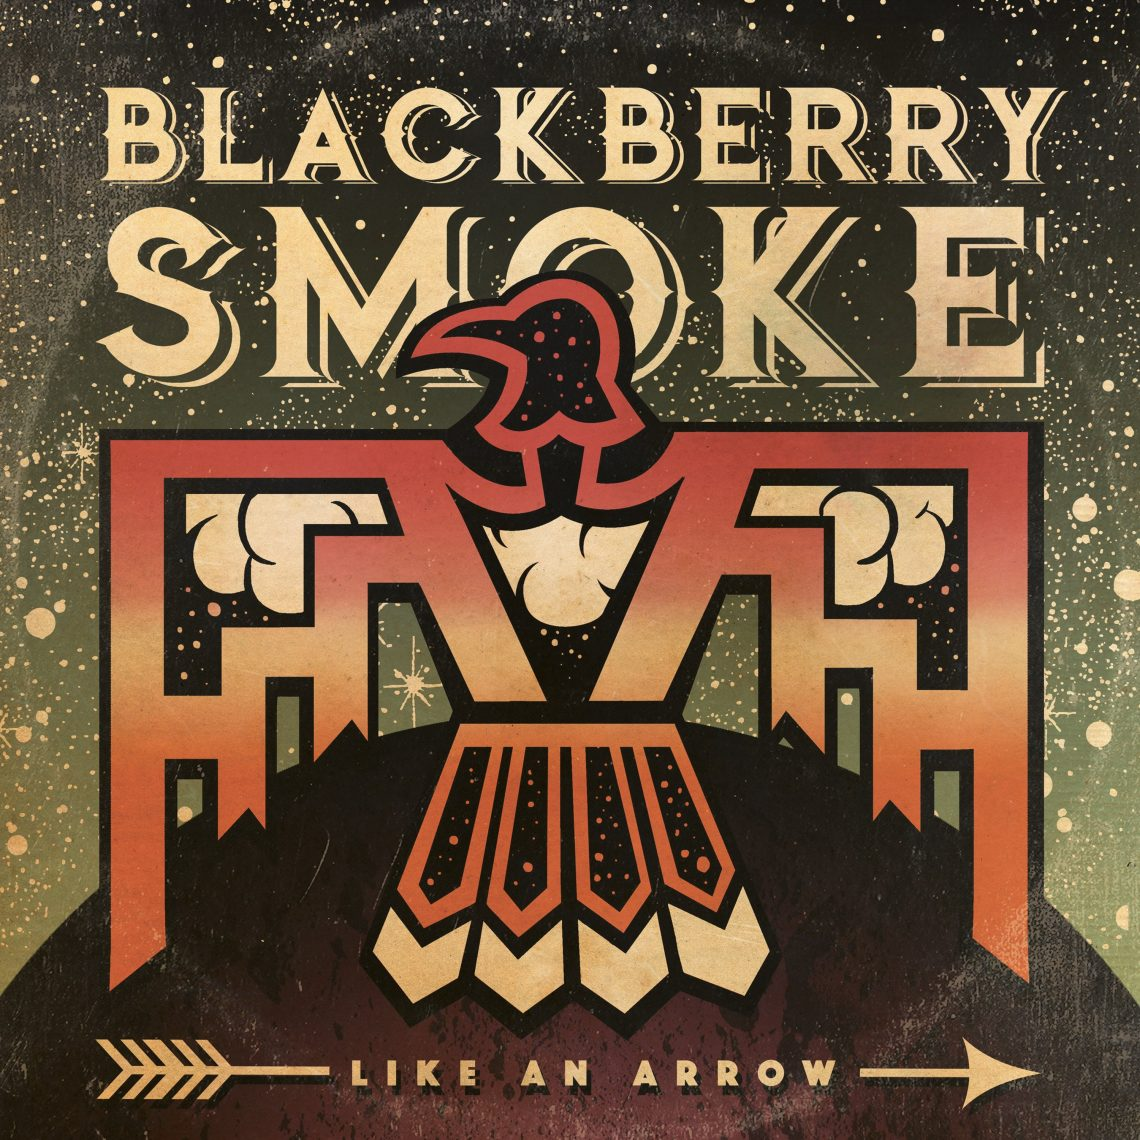 Blackberry Smoke – Like An Arrow CD Review